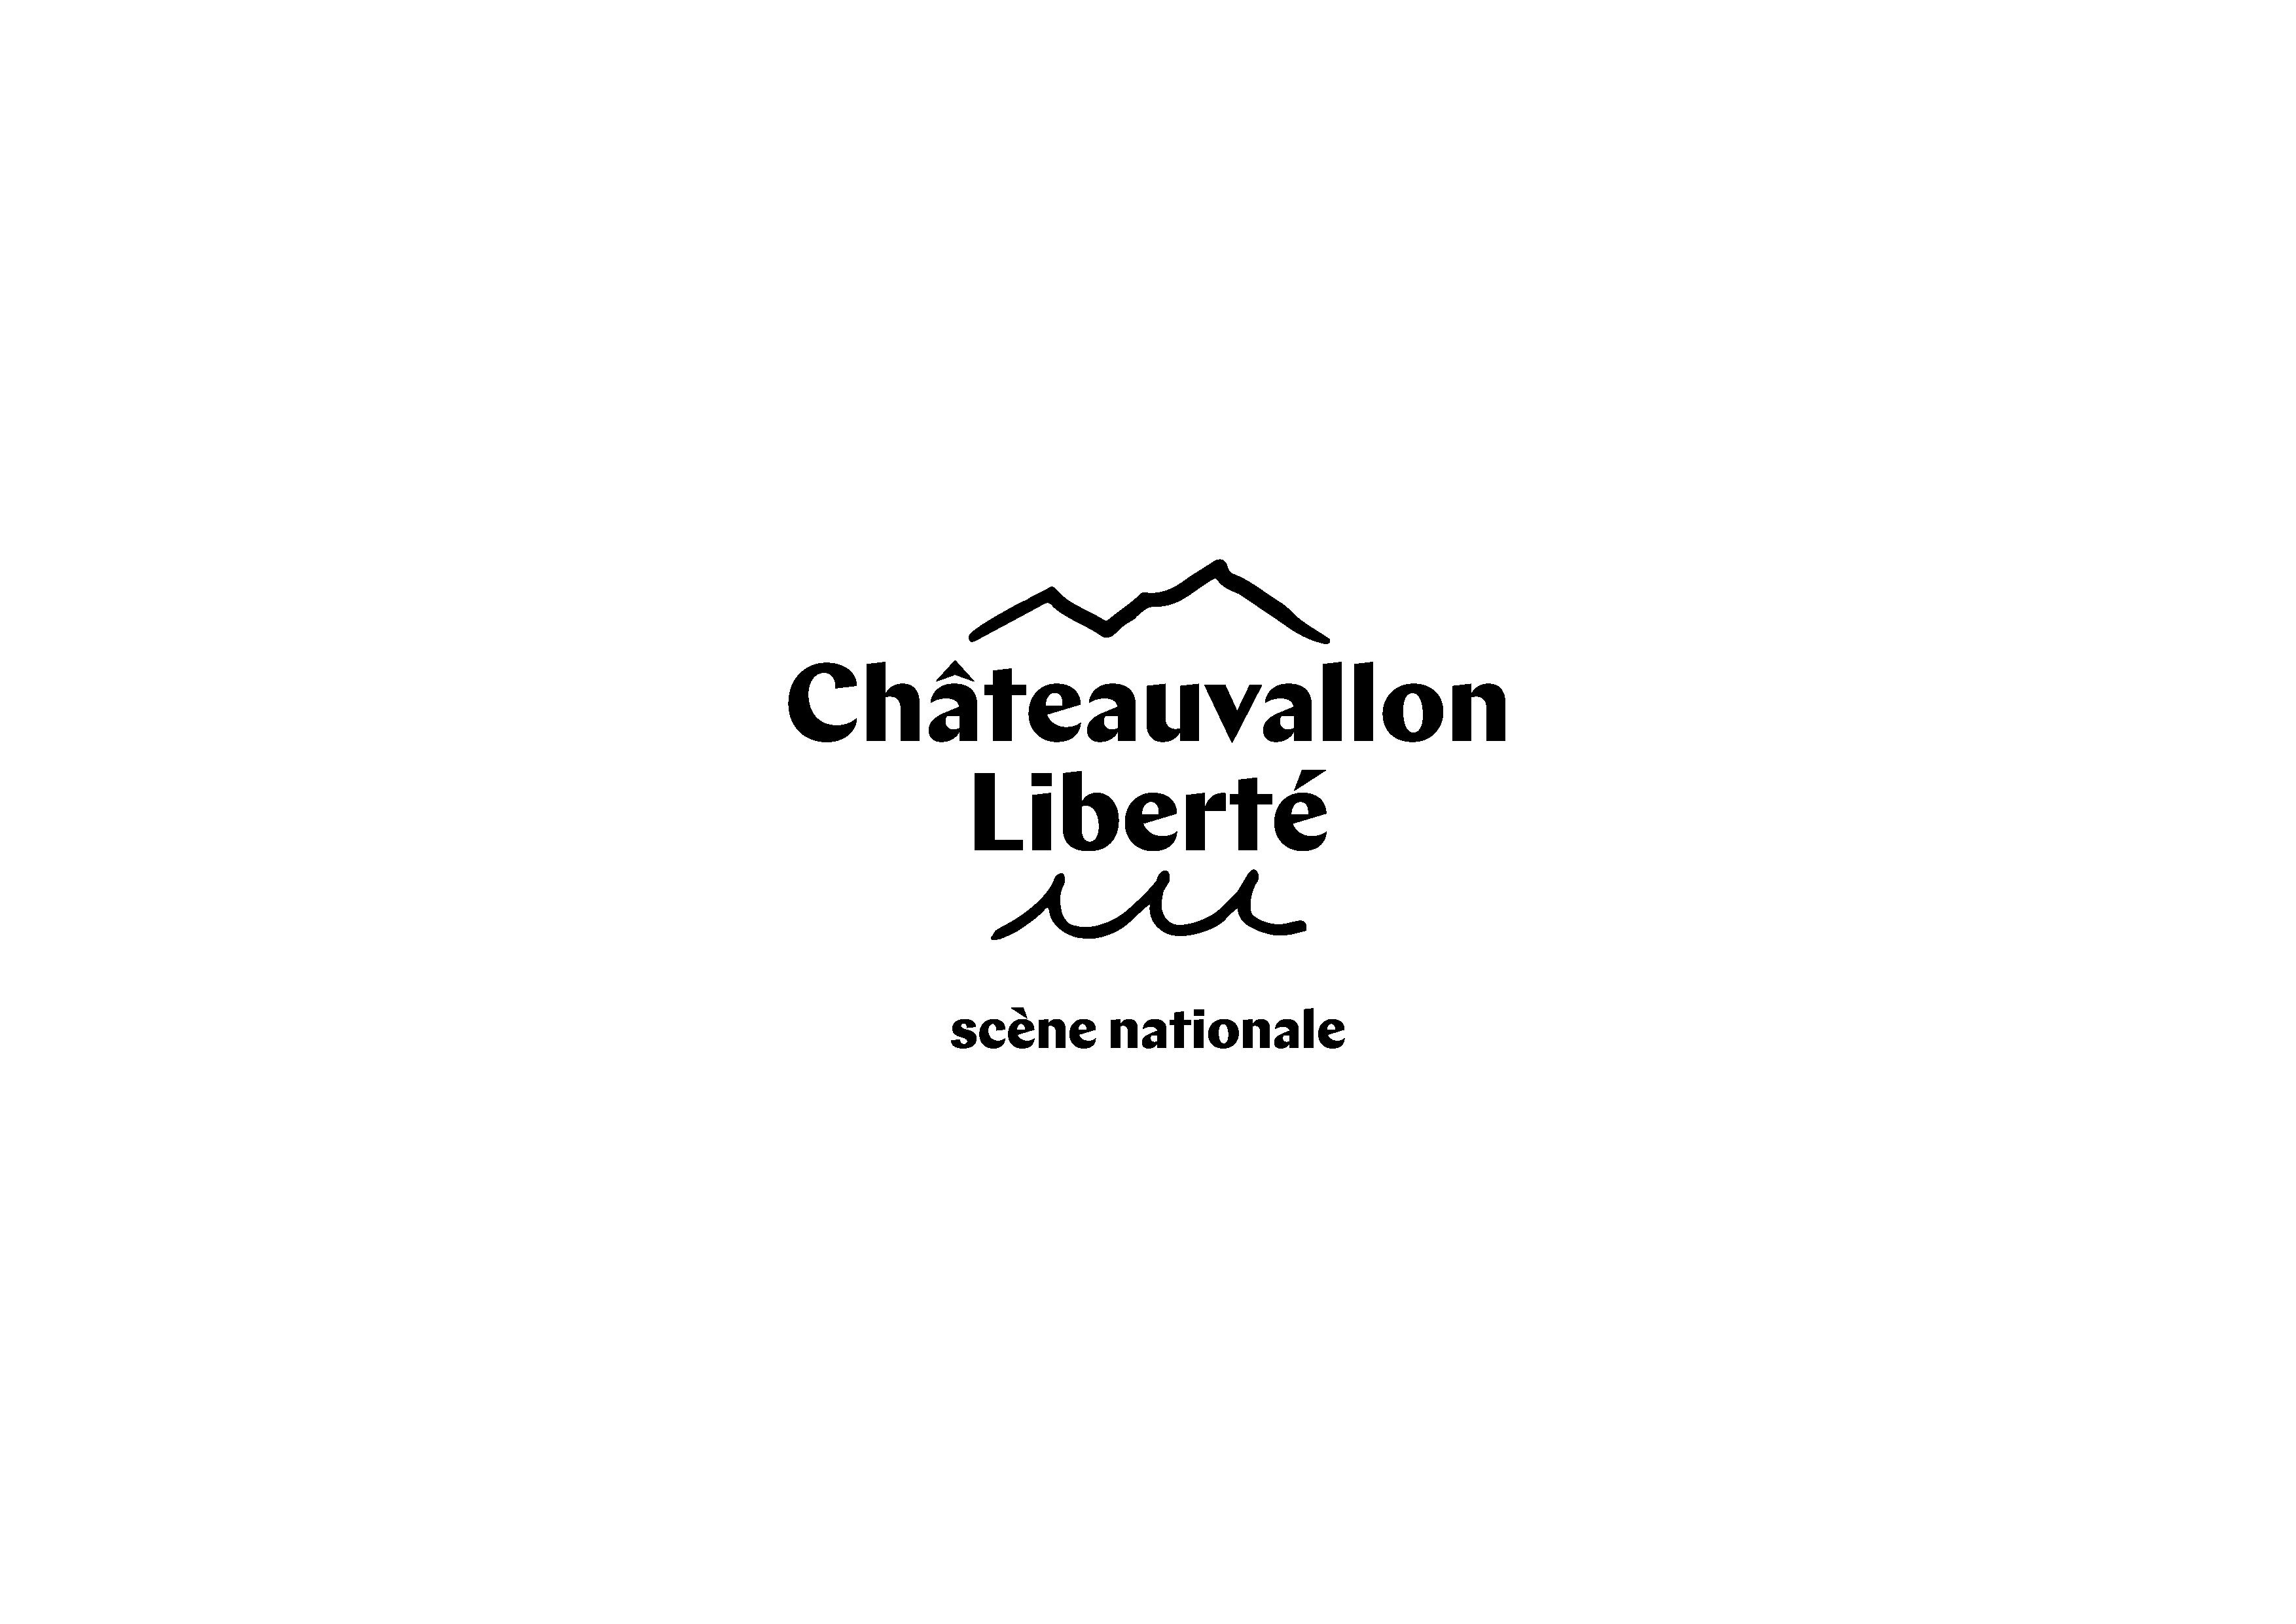 CHATEAUVALLON LIBERTE